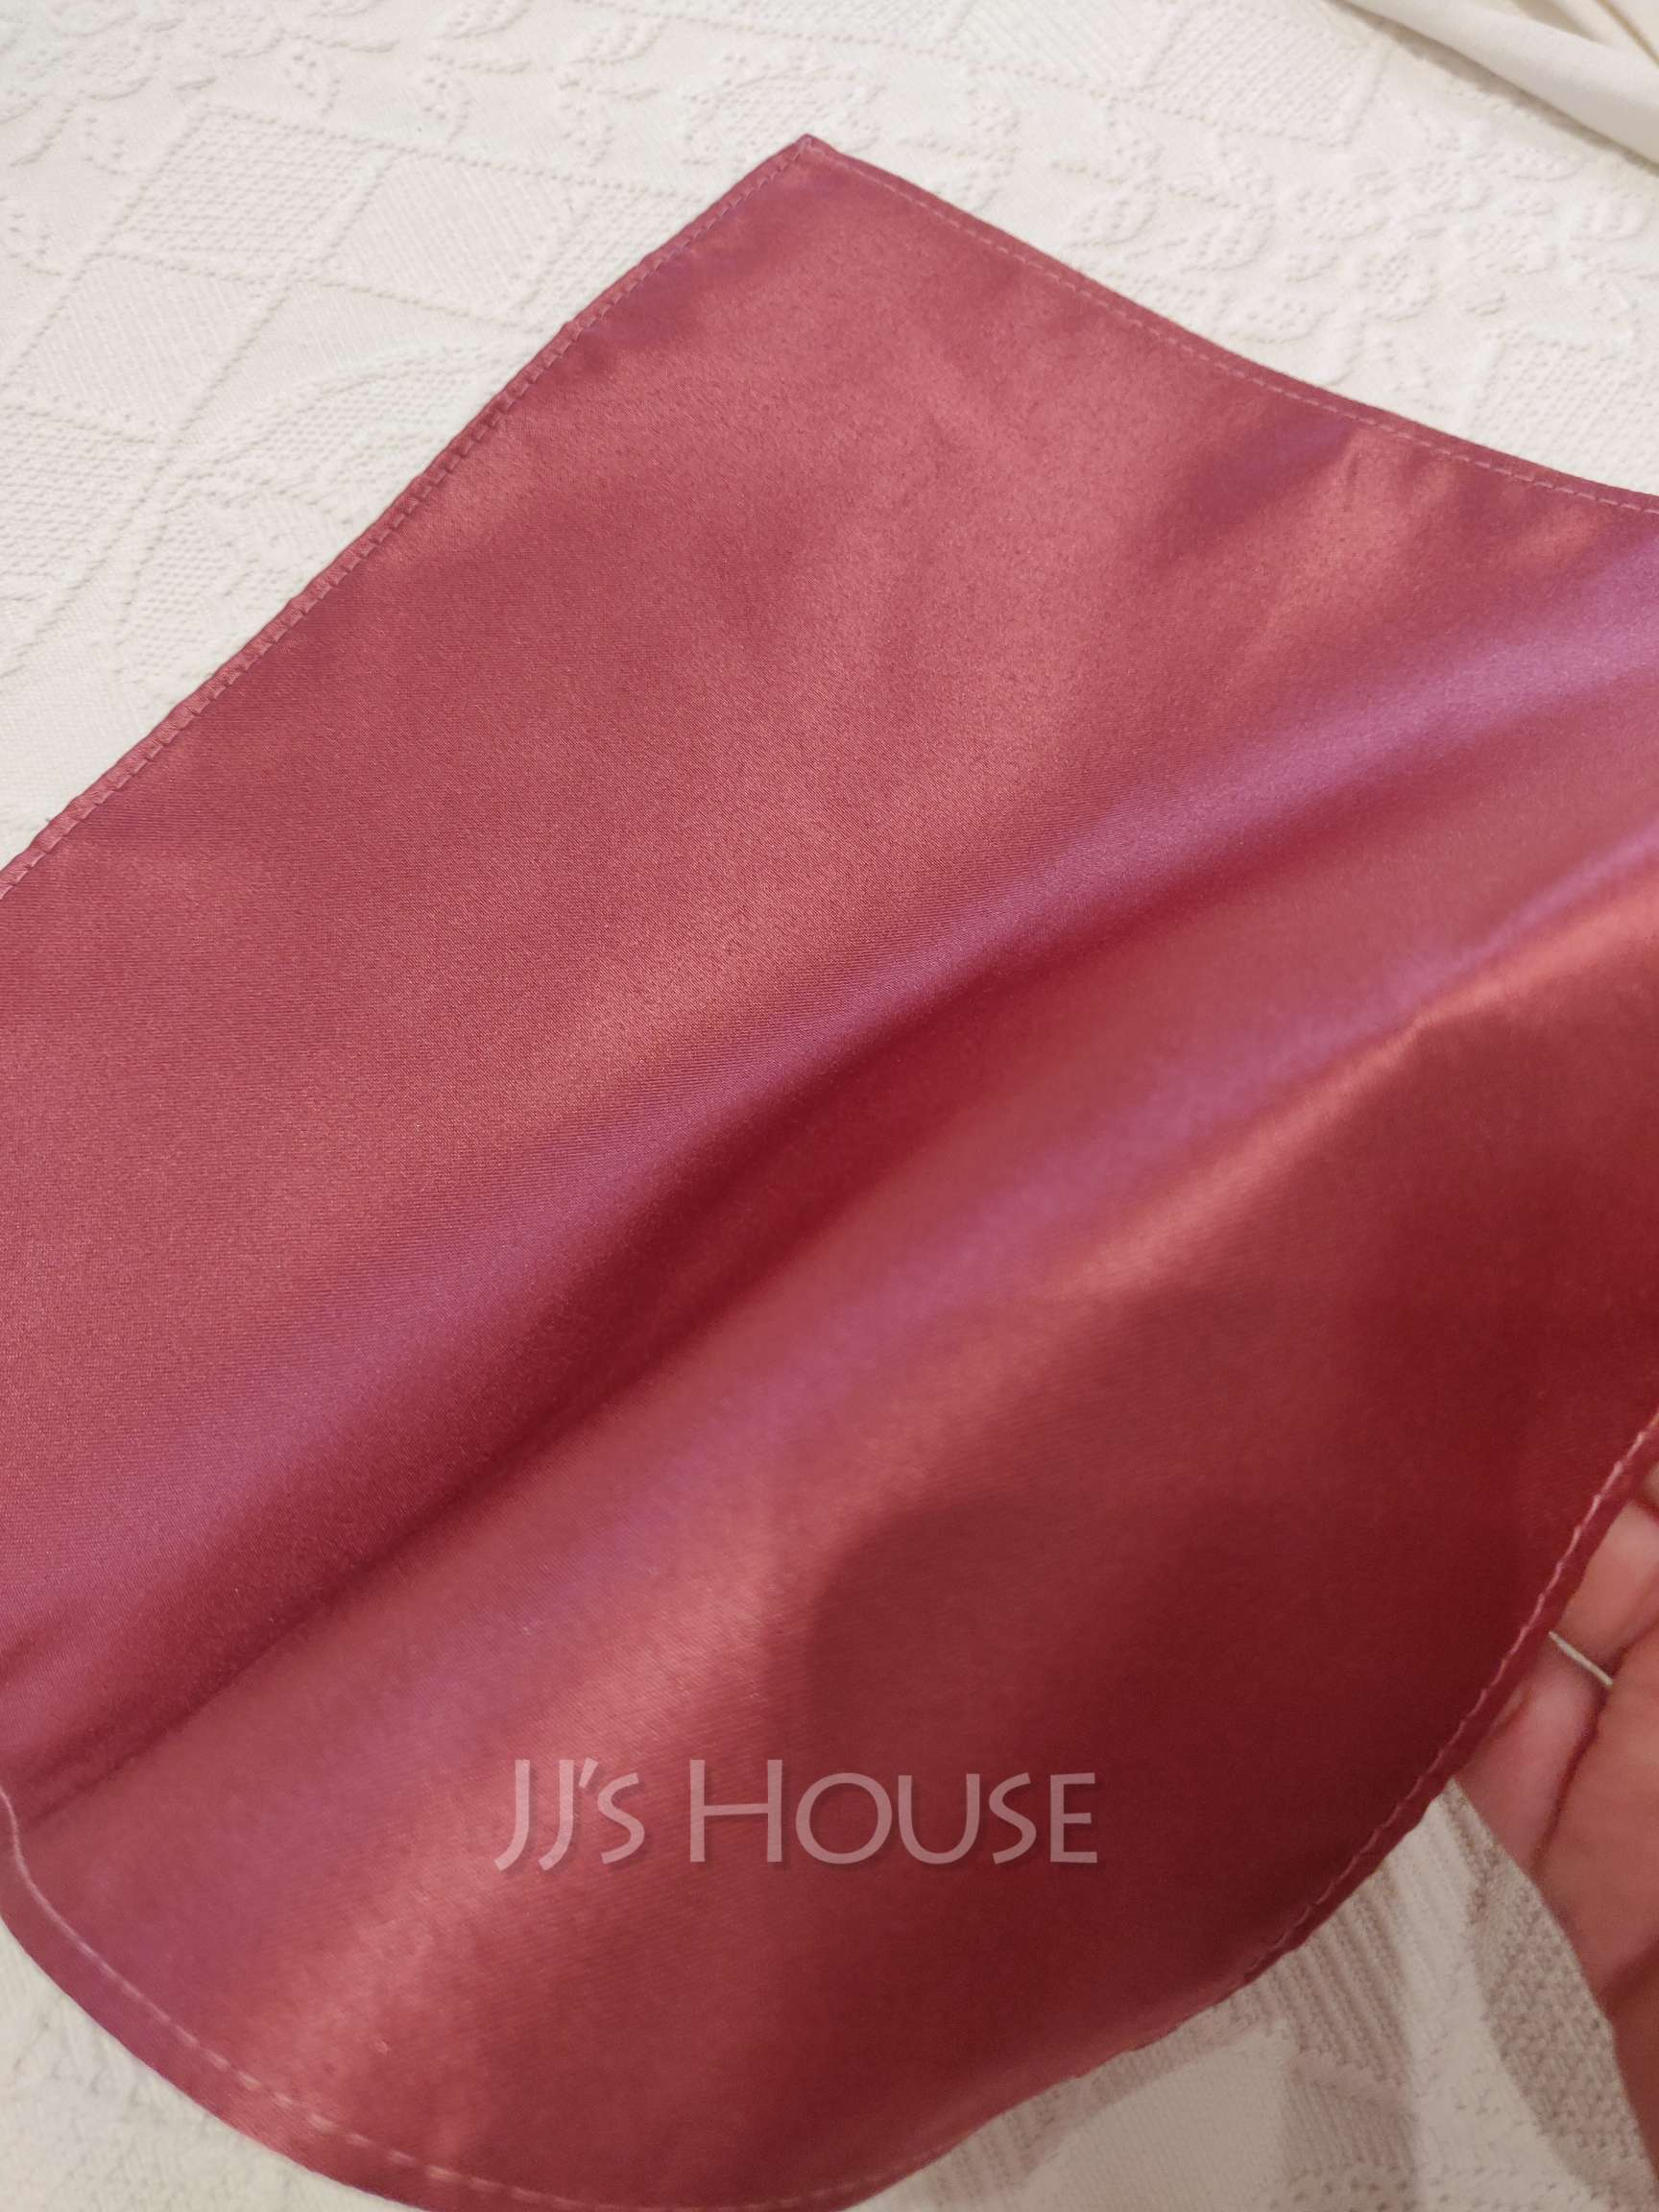 JJ's House Satin Pocket Square